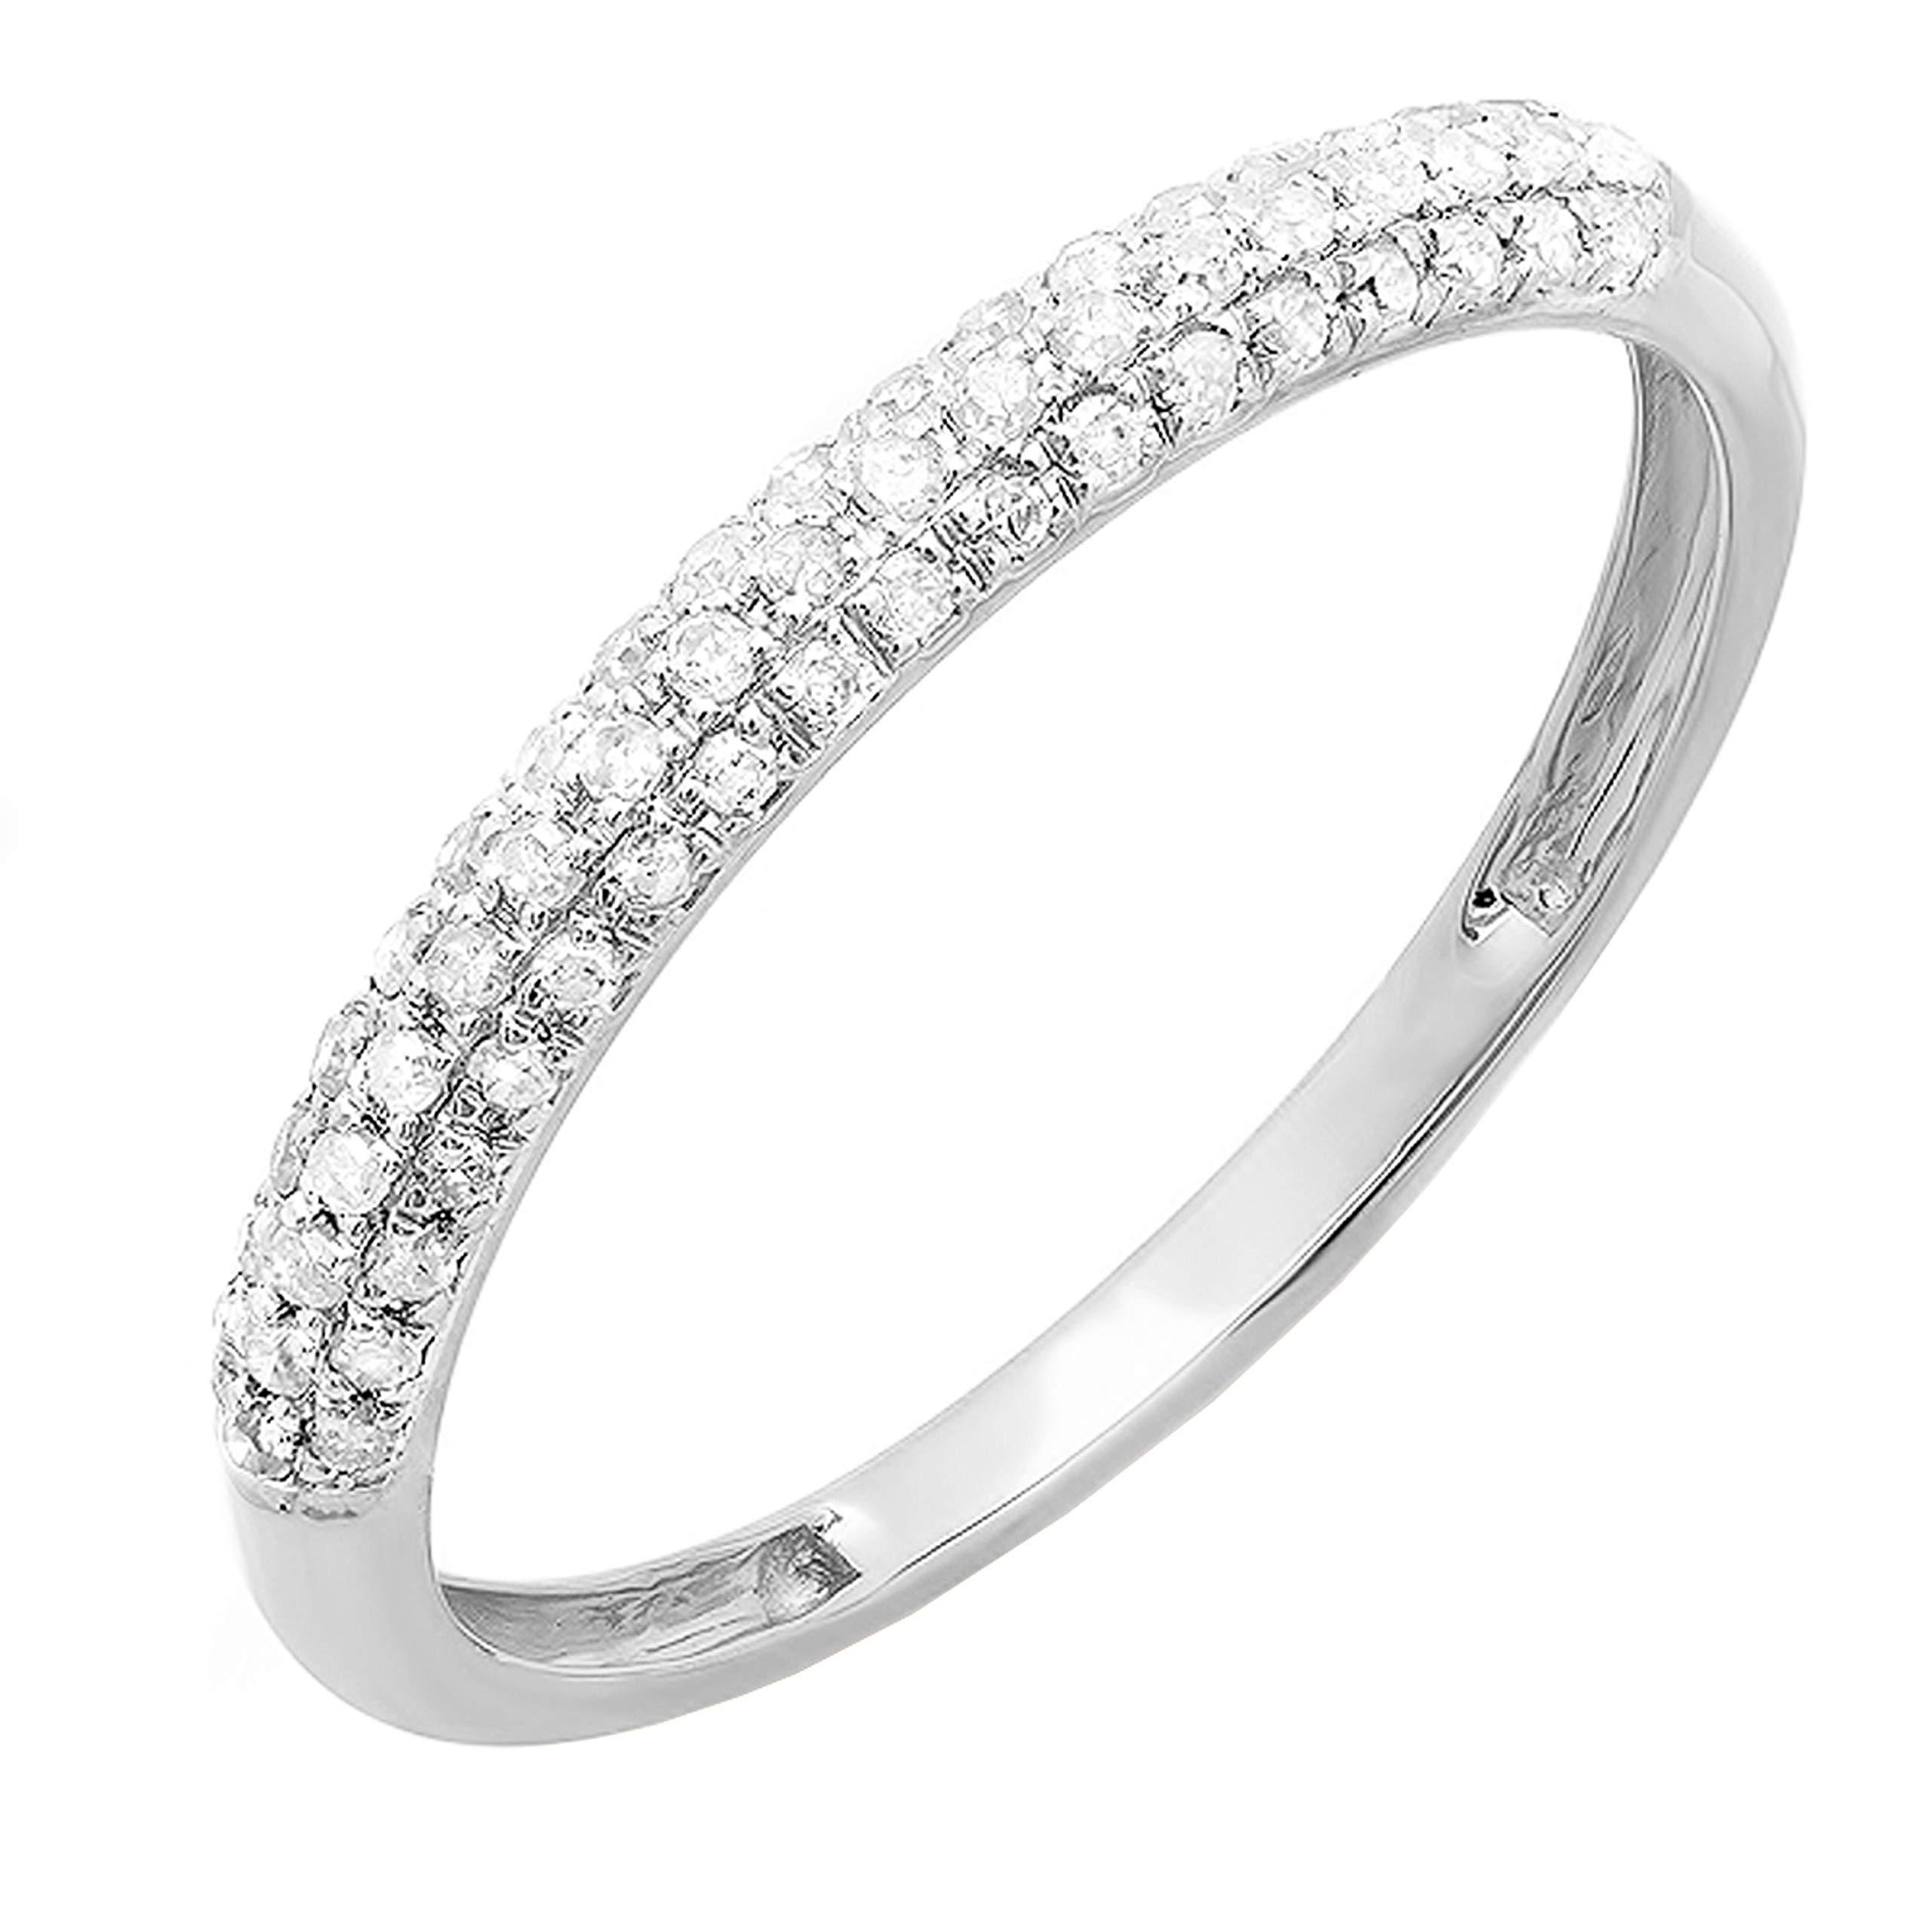 Dazzlingrock Collection 0.20 Carat (ctw) Round White Diamond Ladies Stackable Wedding Band 1/5 CT, 10K Gold